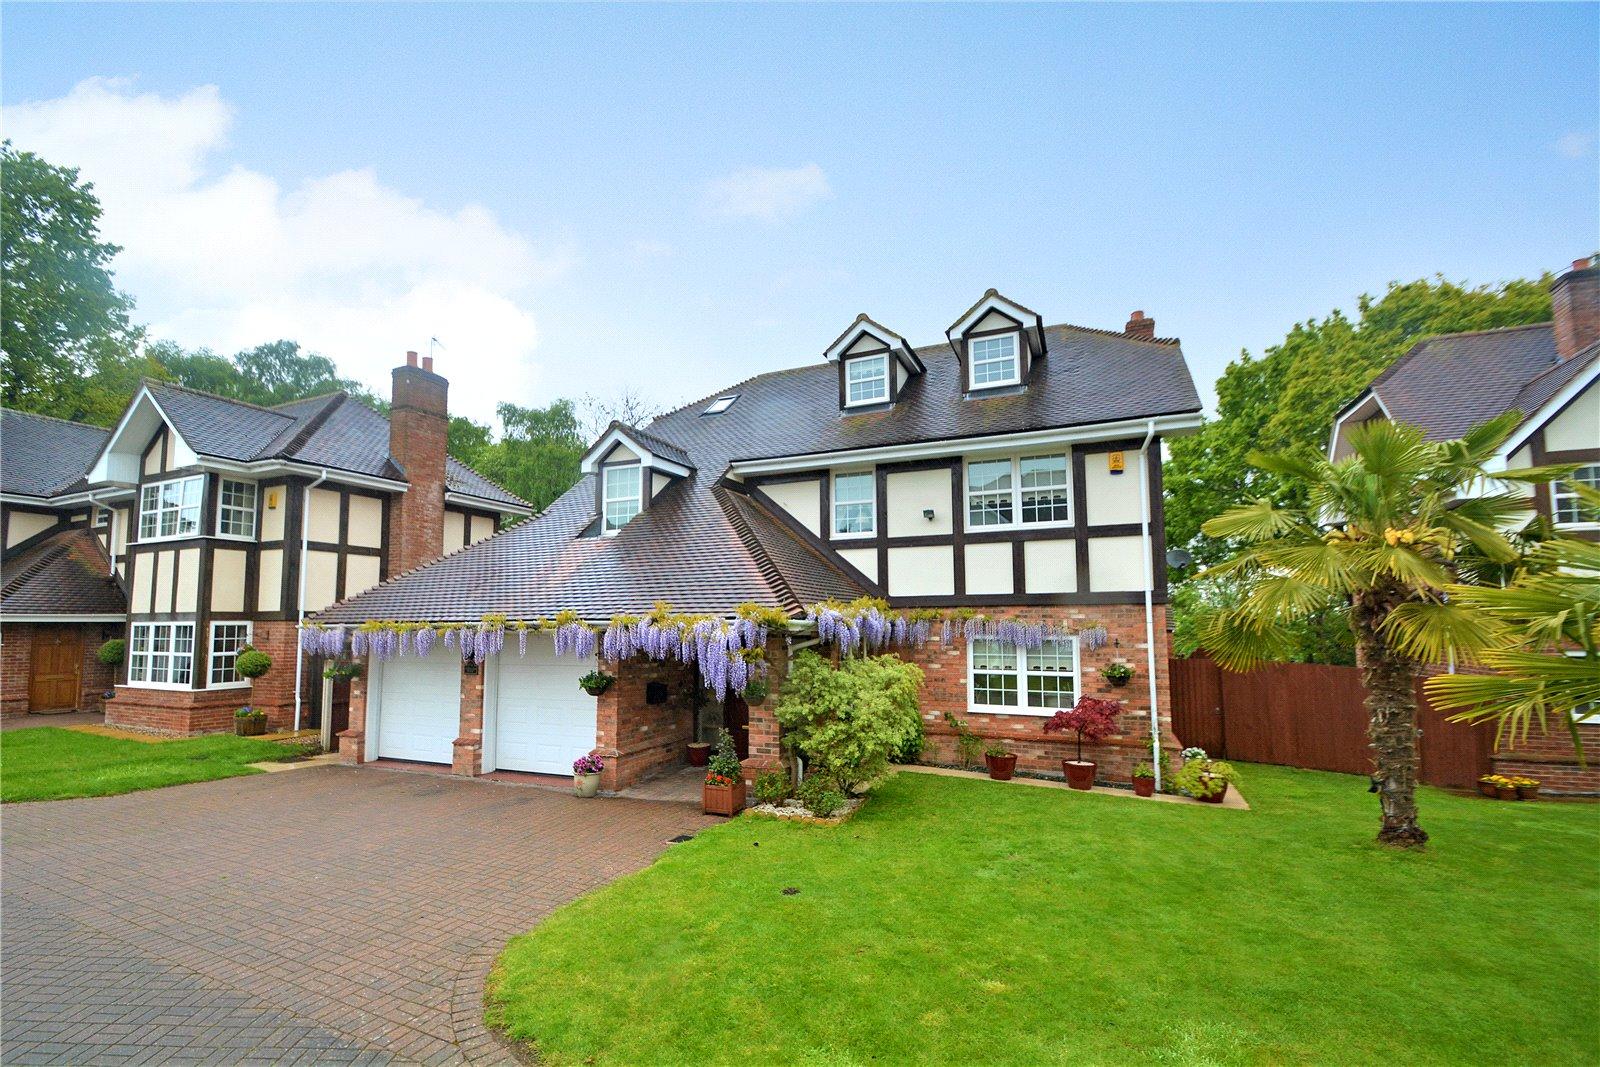 Tantallon House, The Keep, Ironbridge Road, Telford, TF7